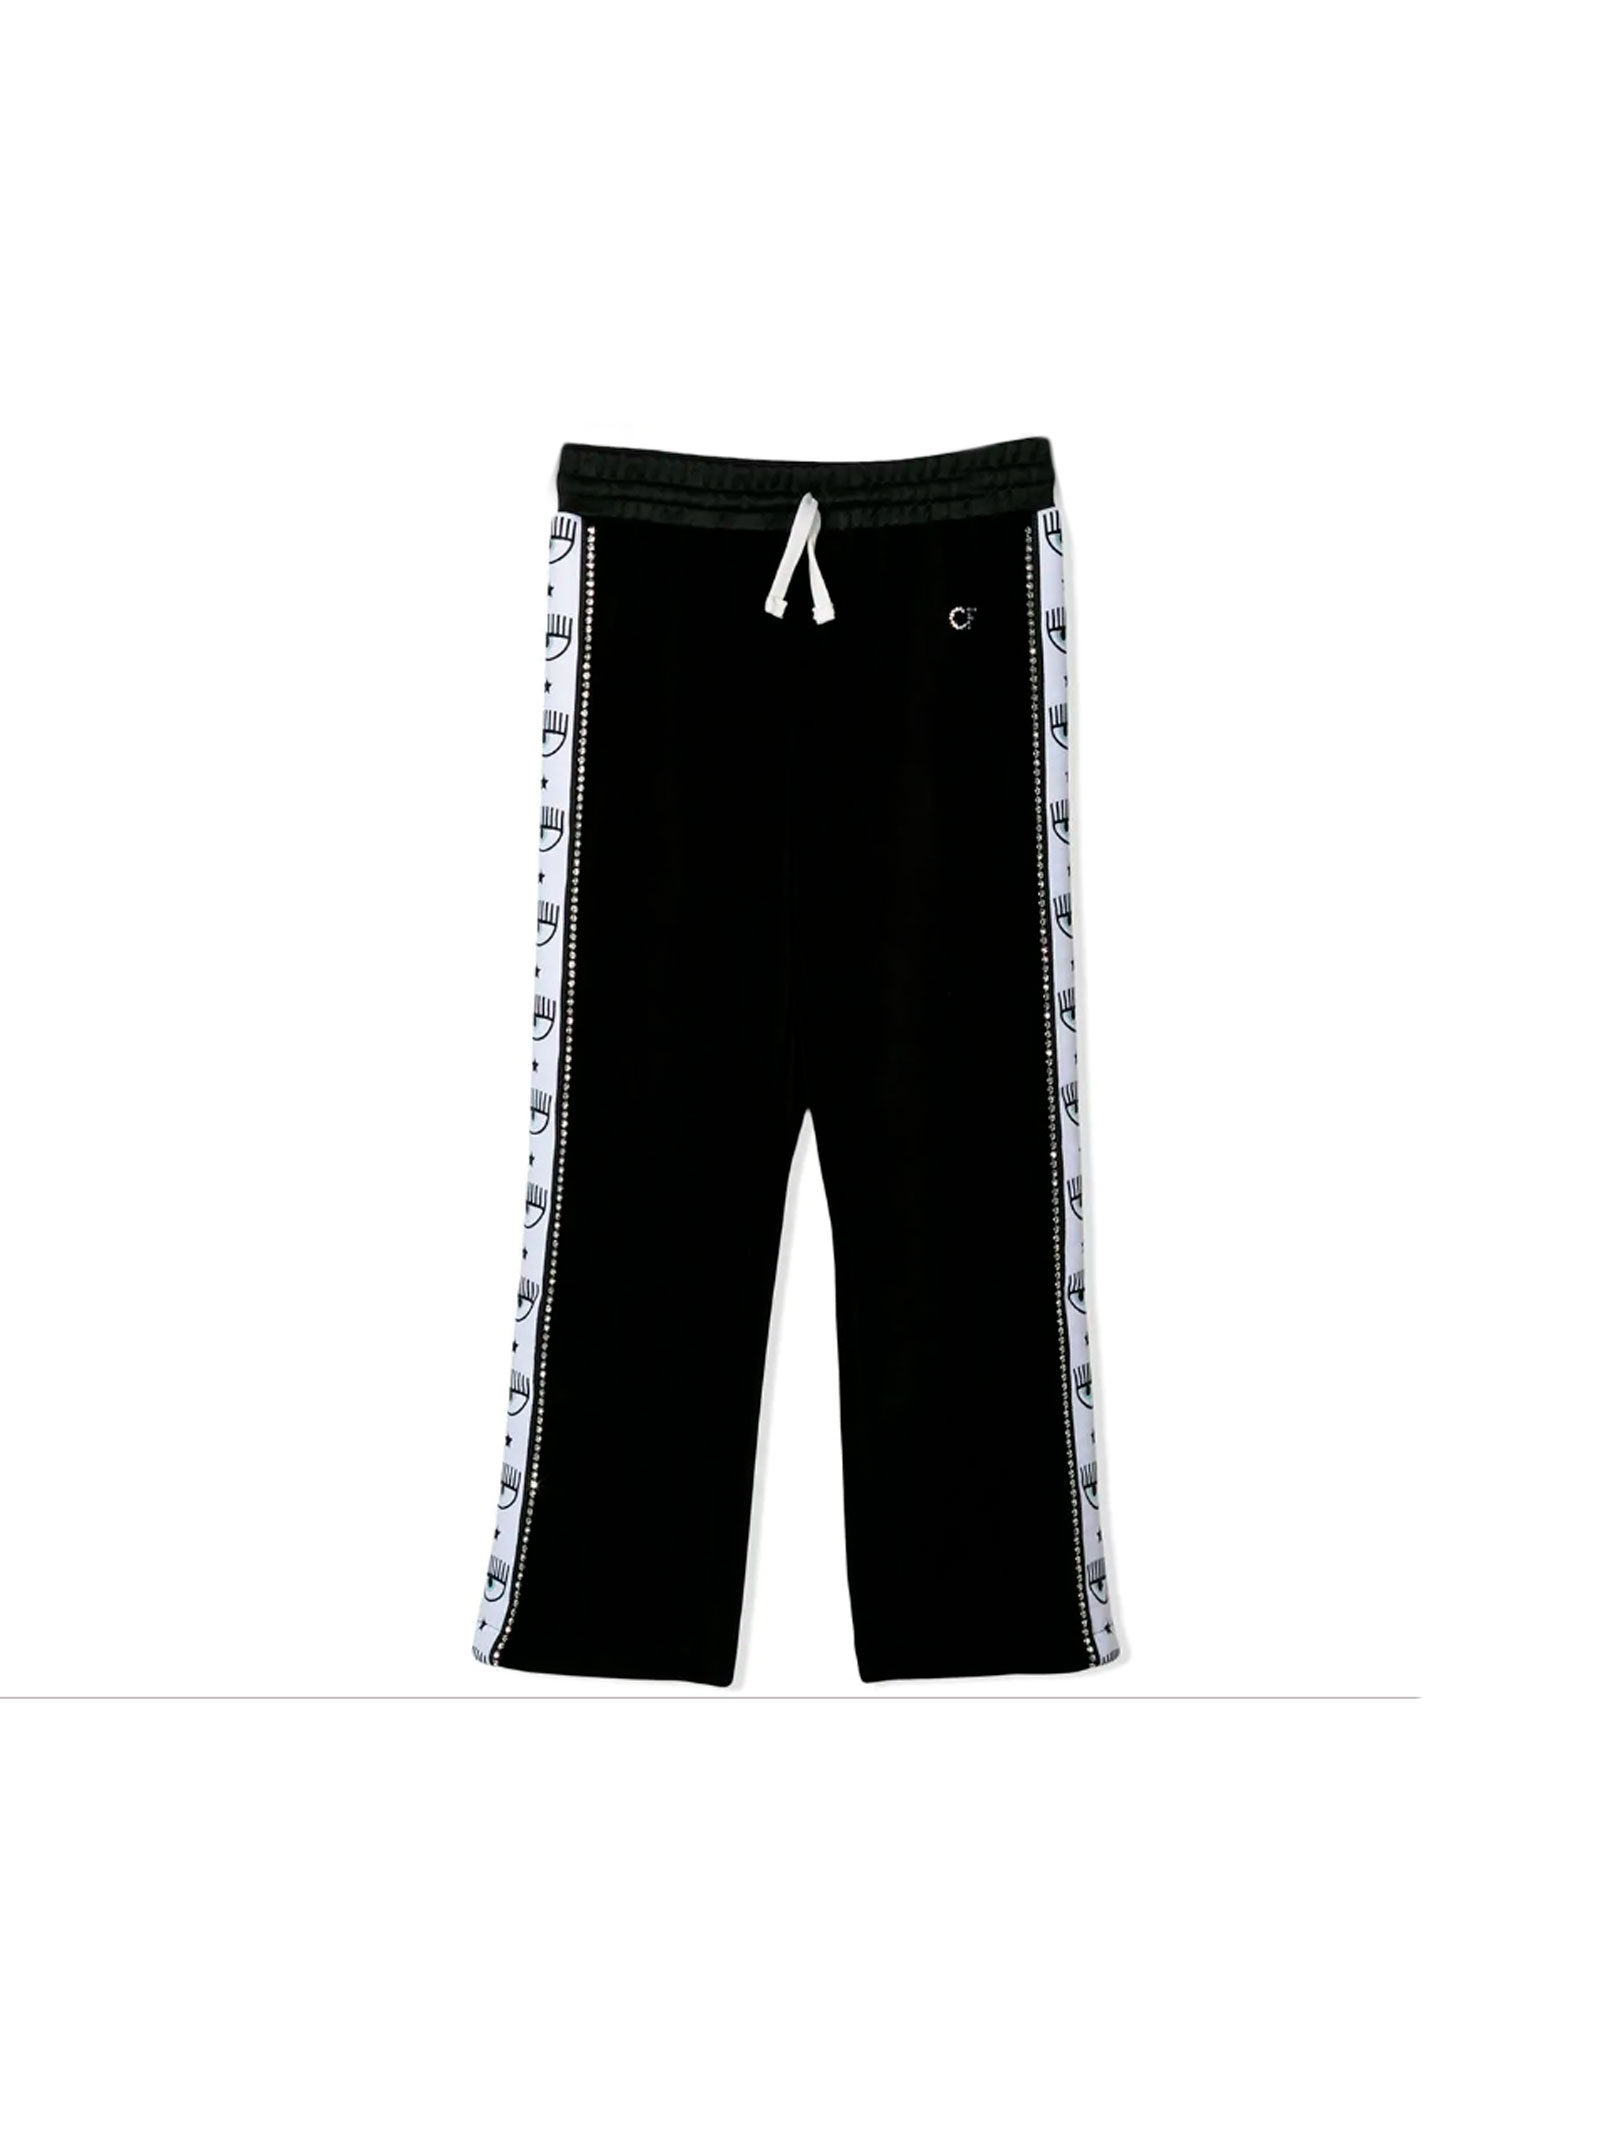 Pantaloni neri con bande laterali logate Chiara Ferragni kids CHIARA FERRAGNI KIDS | 9 | CFKP006NERO